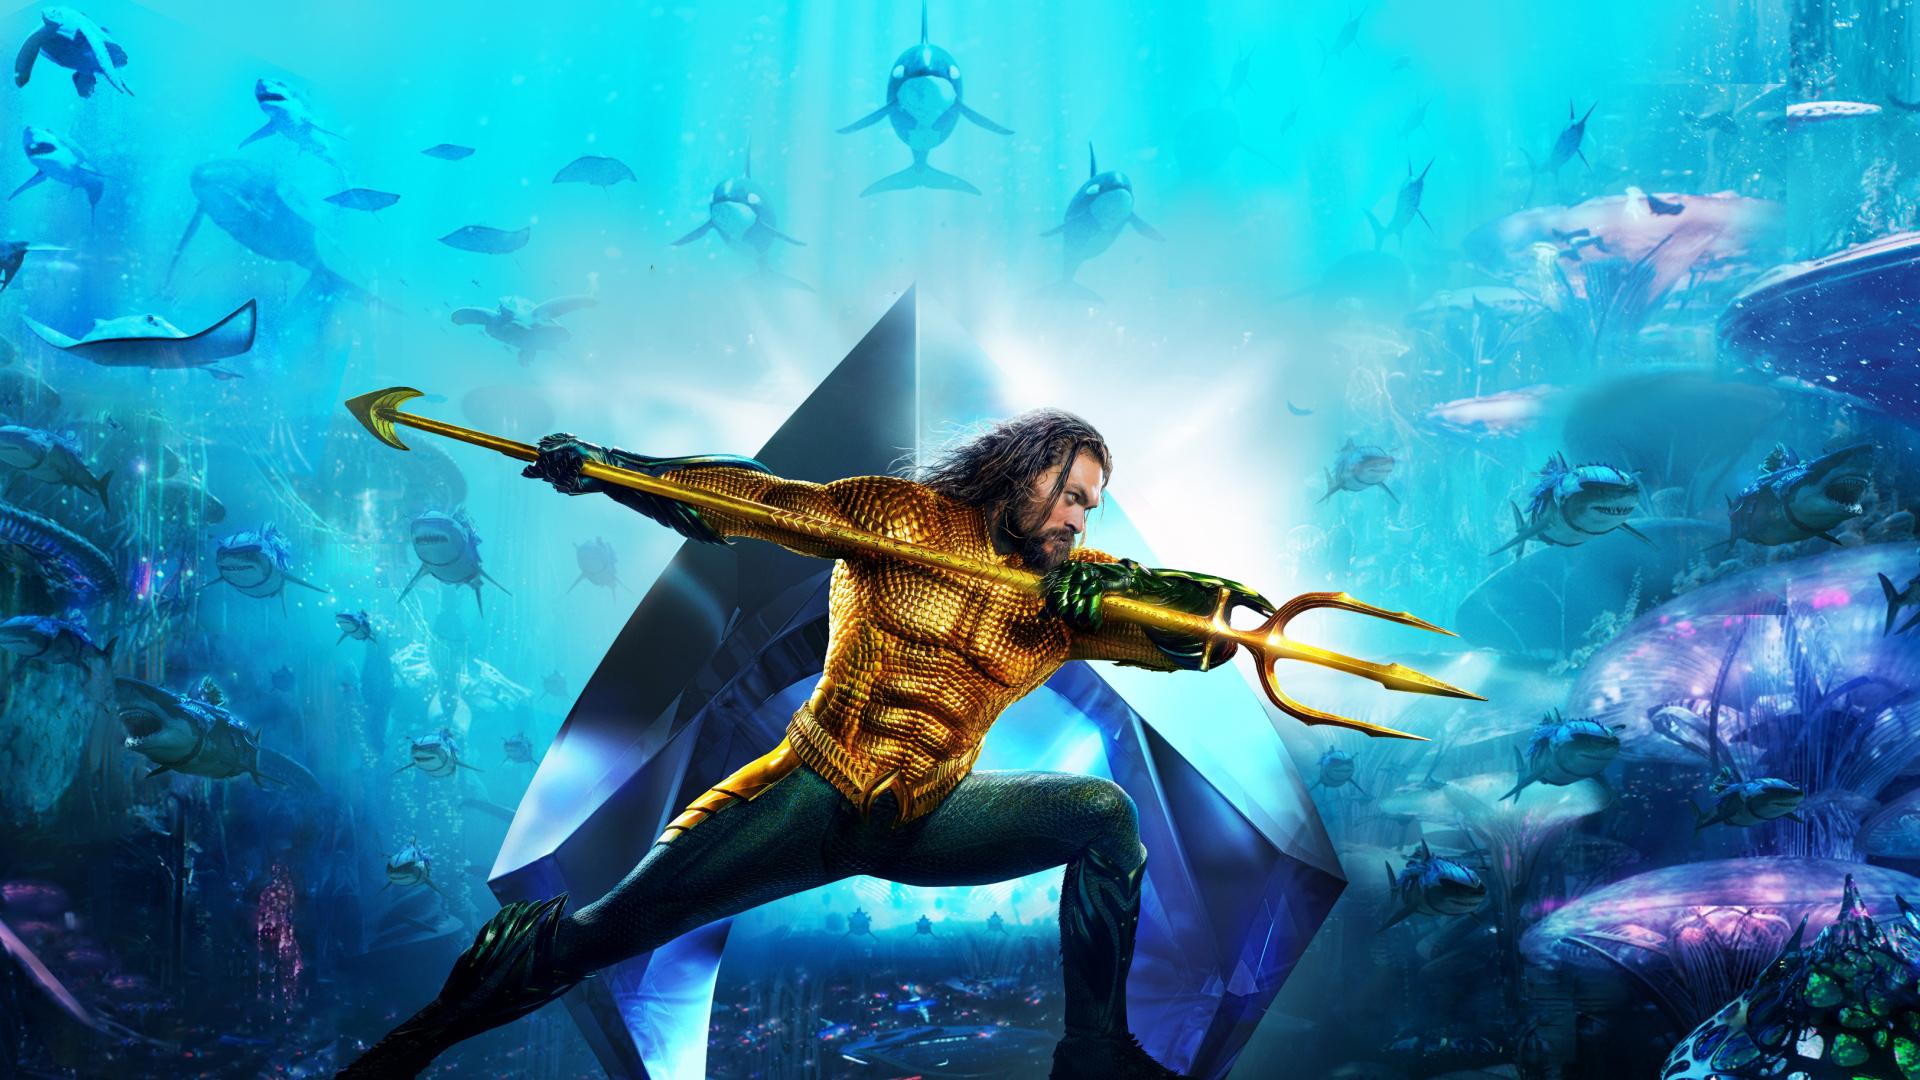 Aquaman 2018 Movie 4k Wallpapers: Aquaman 2018 Movie Banner Textless, HD 4K Wallpaper